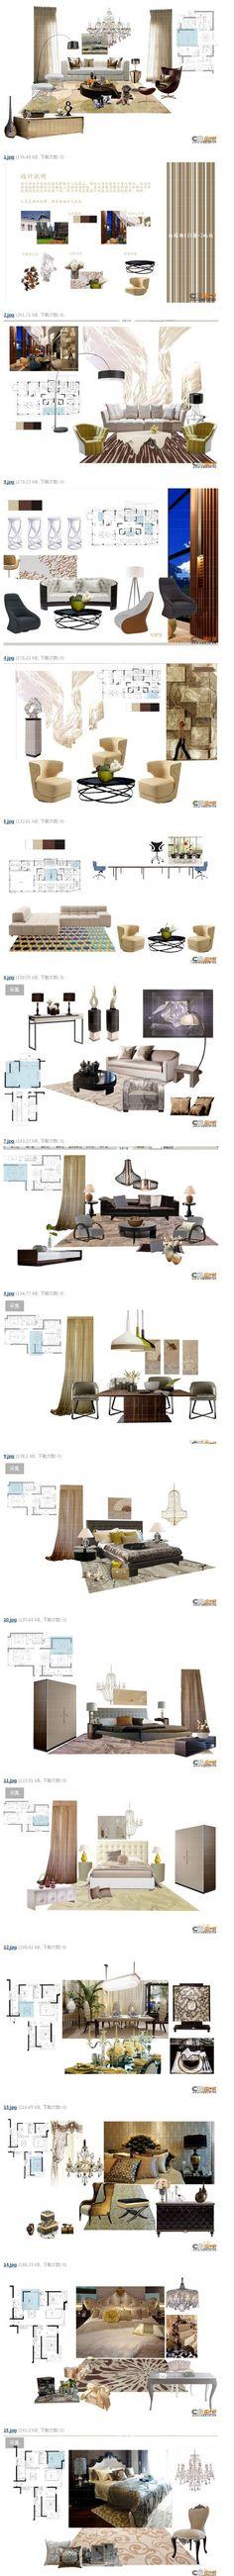 CCD--南塔街129巷项目三套样板房及...: